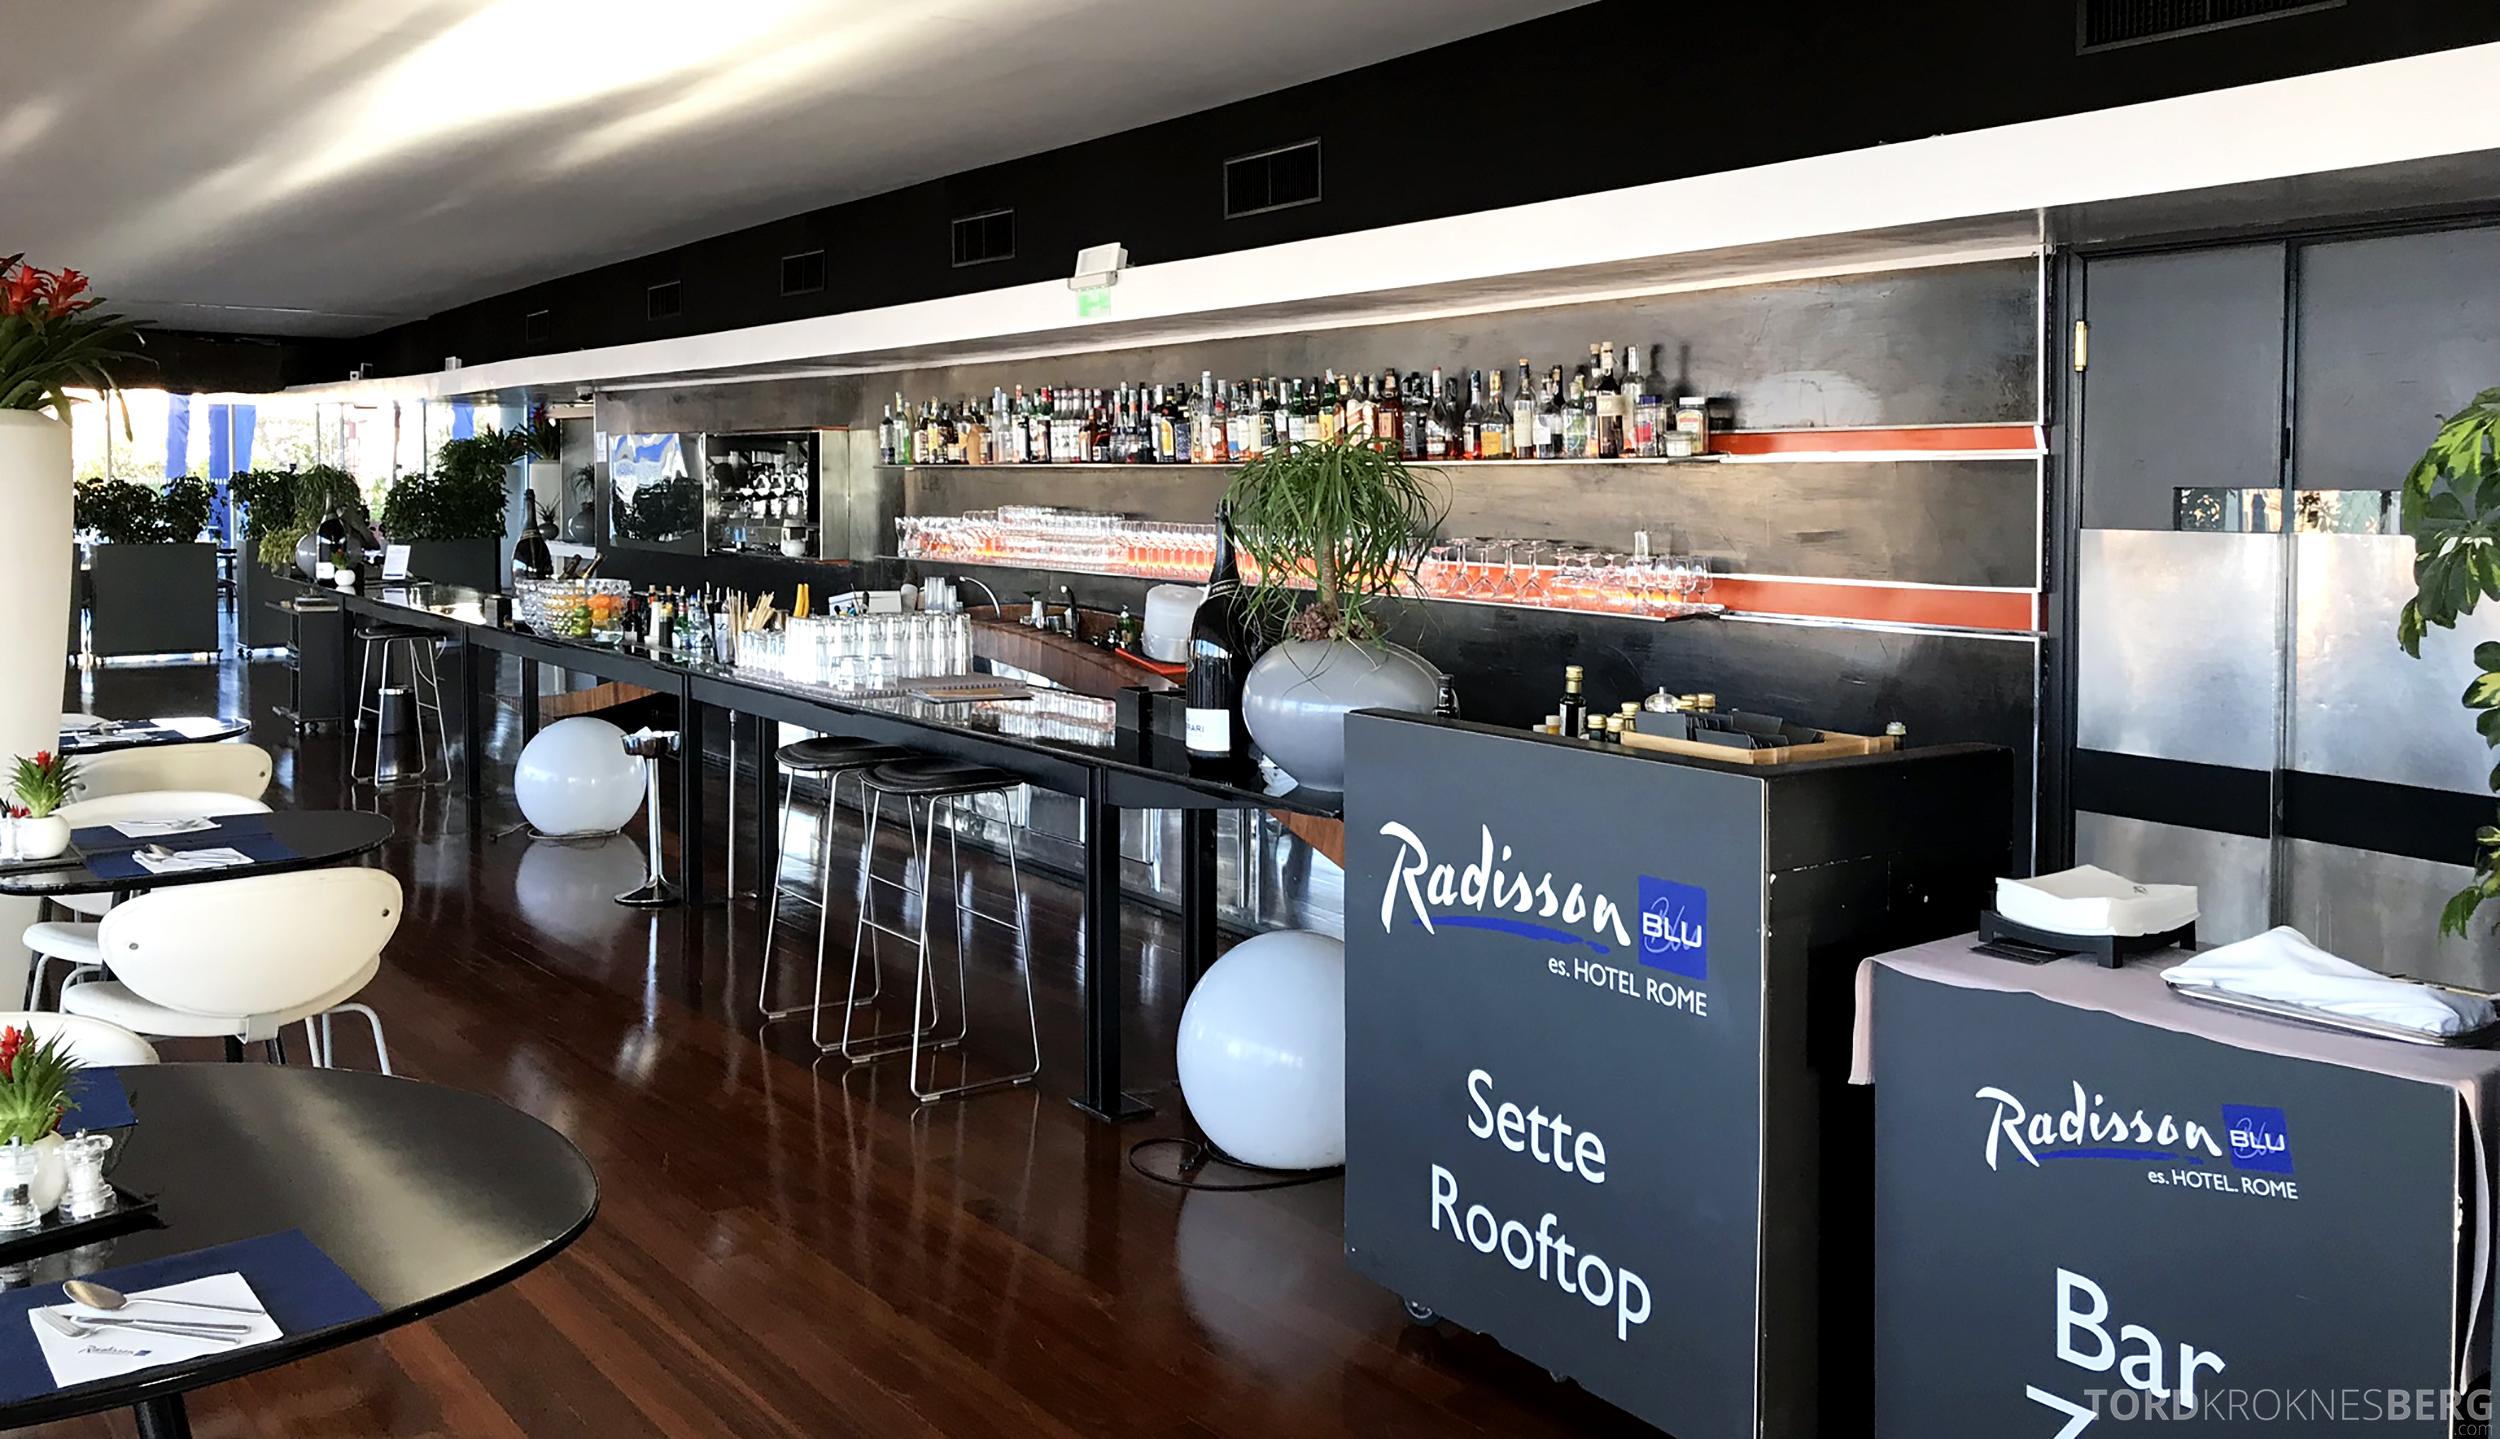 Radisson Blu Rome Hotel bar